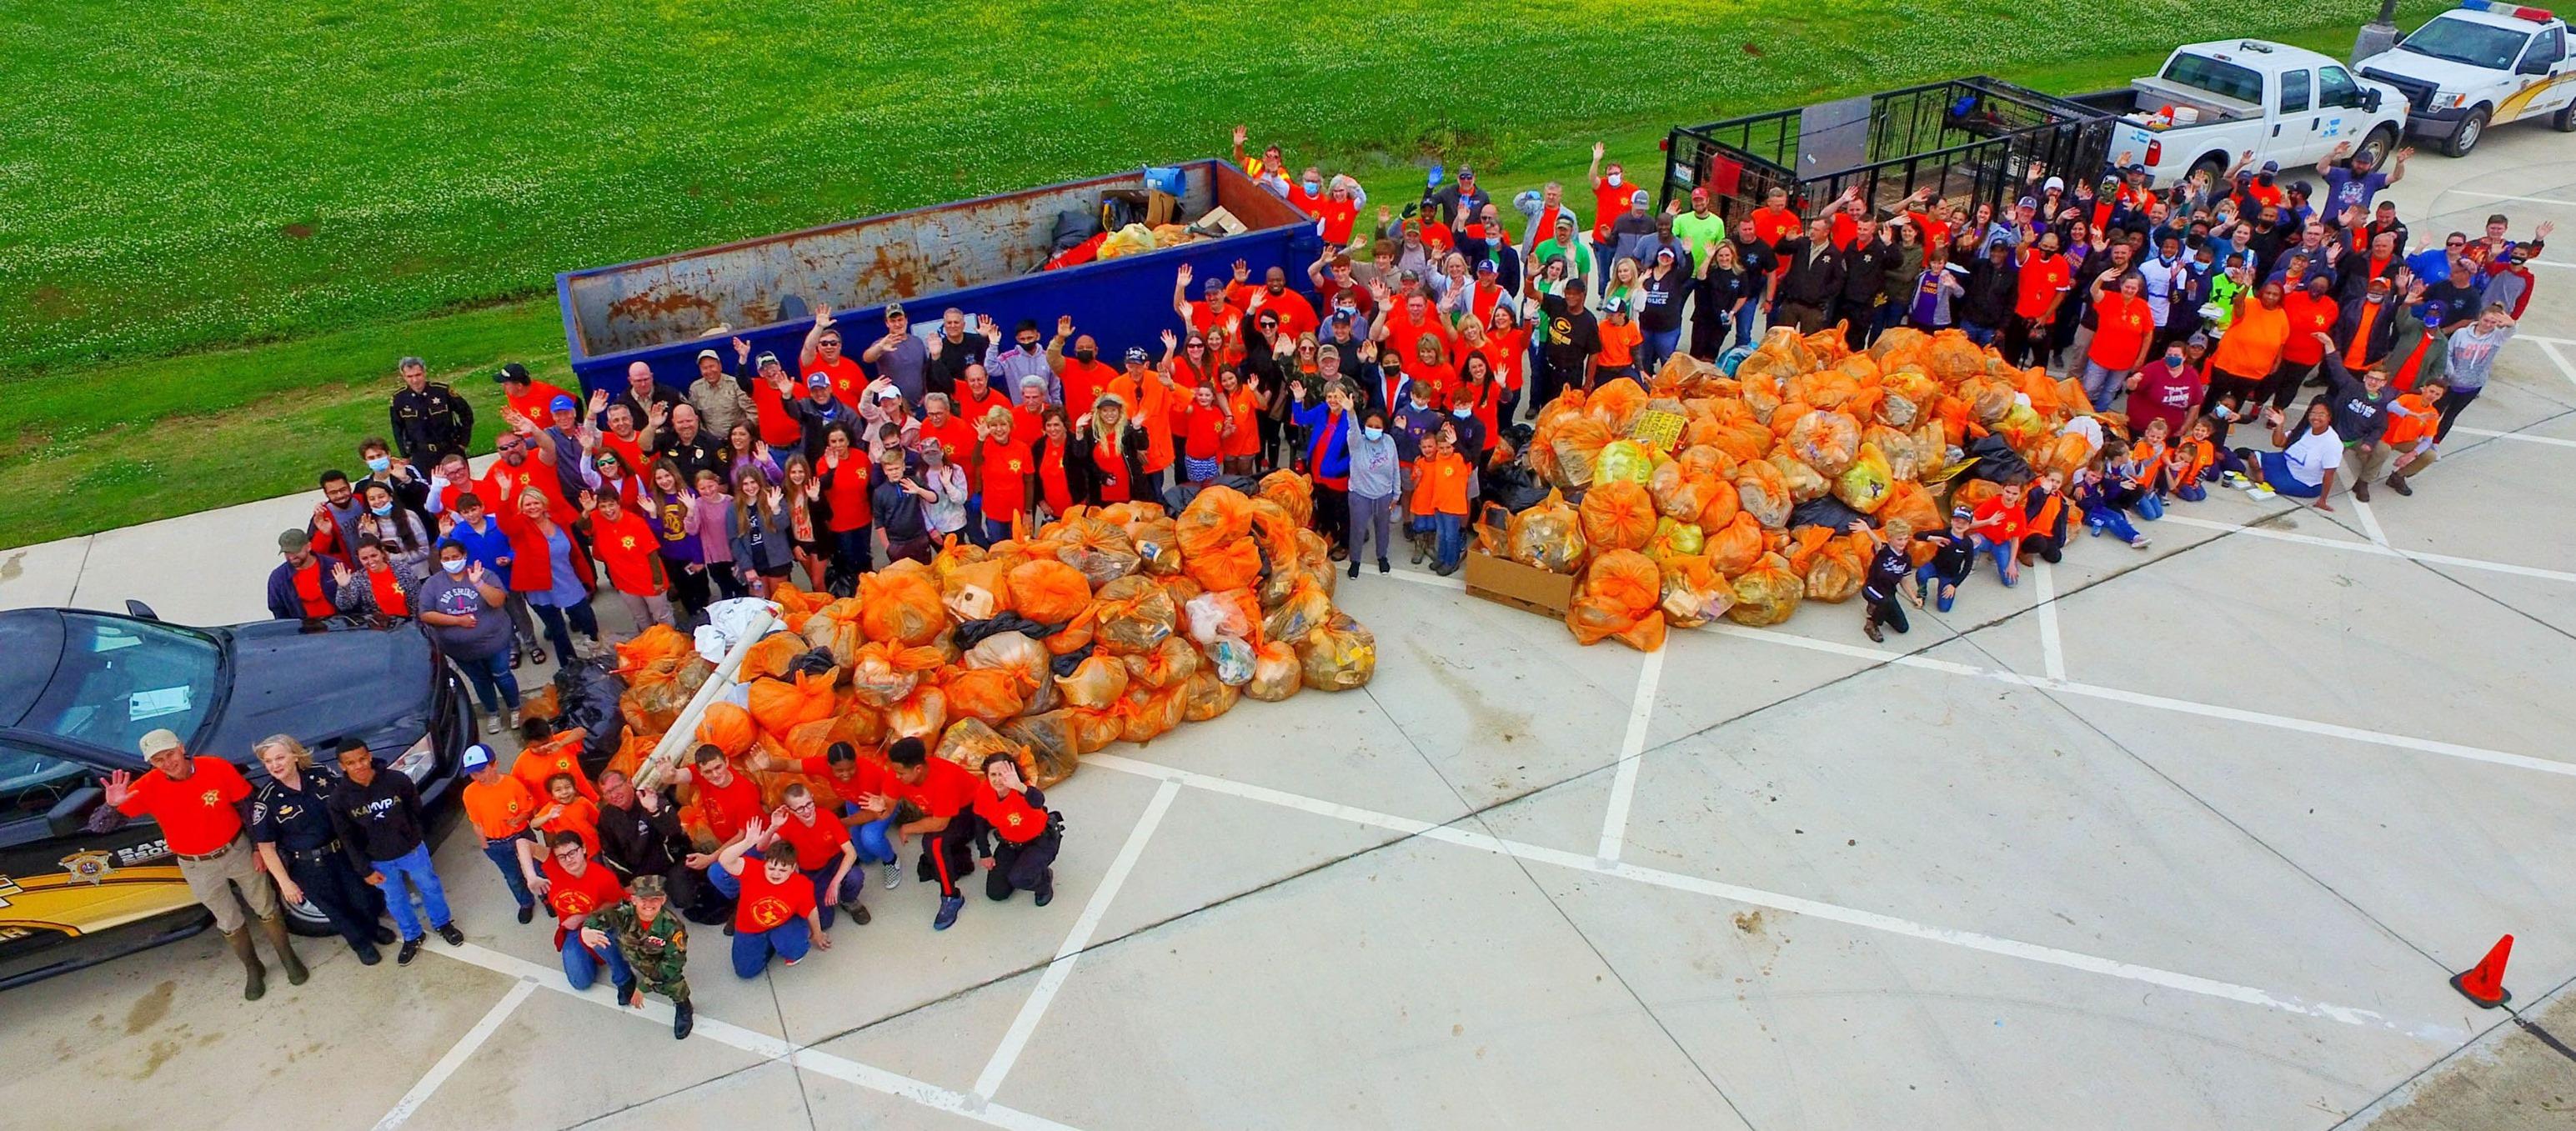 U. L. Coleman Companies Celebrates Earth Day